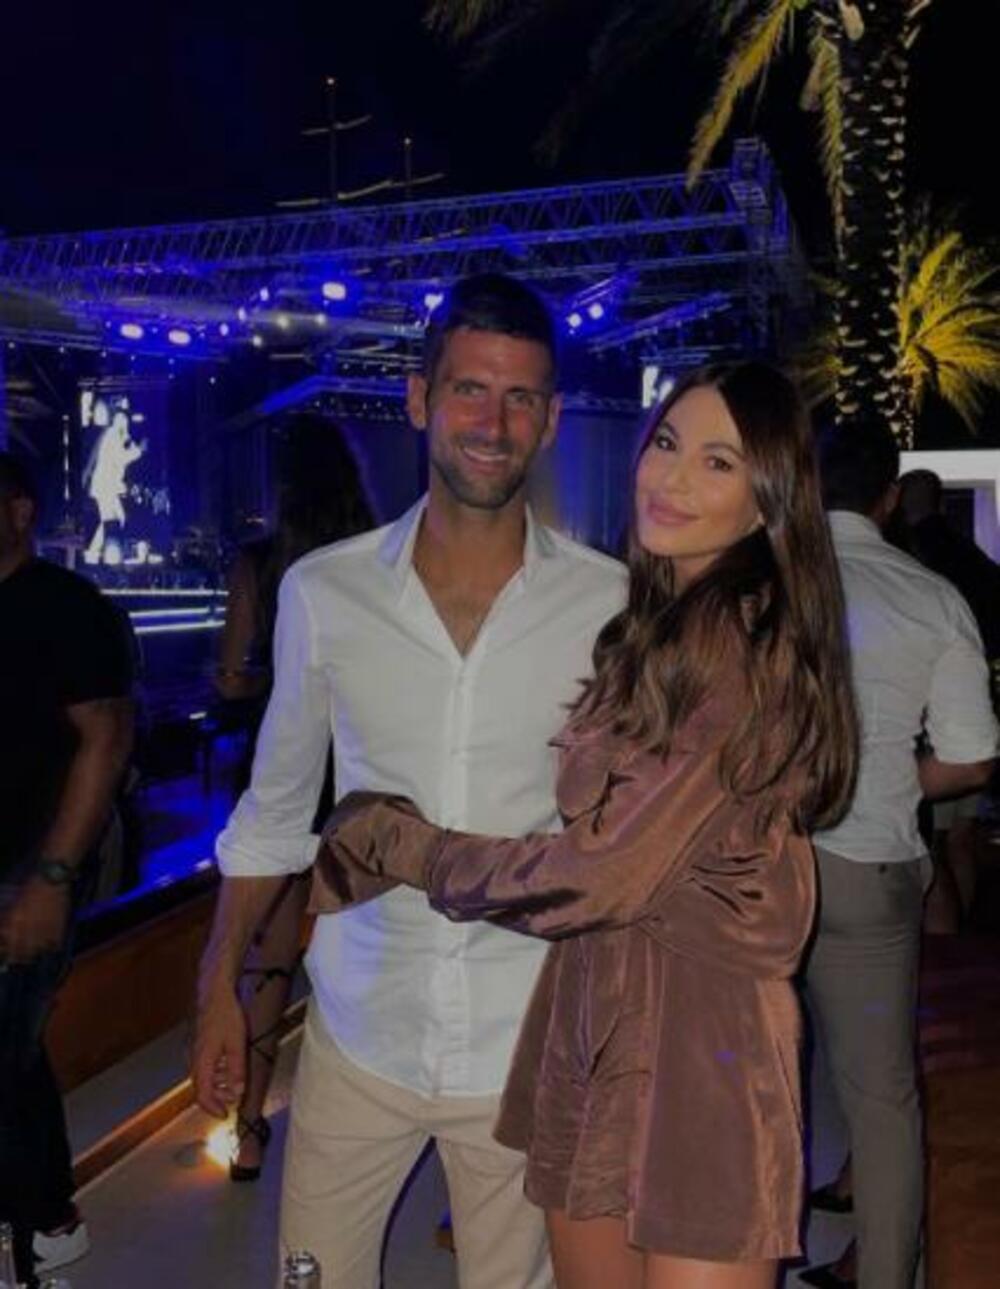 <p>Najuspešniji srpski teniser <strong>Novak Đoković </strong>i njegova supruga <strong>Jelena </strong>provode nezaboravne dane na crnogorskom primorju, a dok se teniser priprema za US Open, našao se u društvu popularne glumice, pevačice, košarkaša...</p>